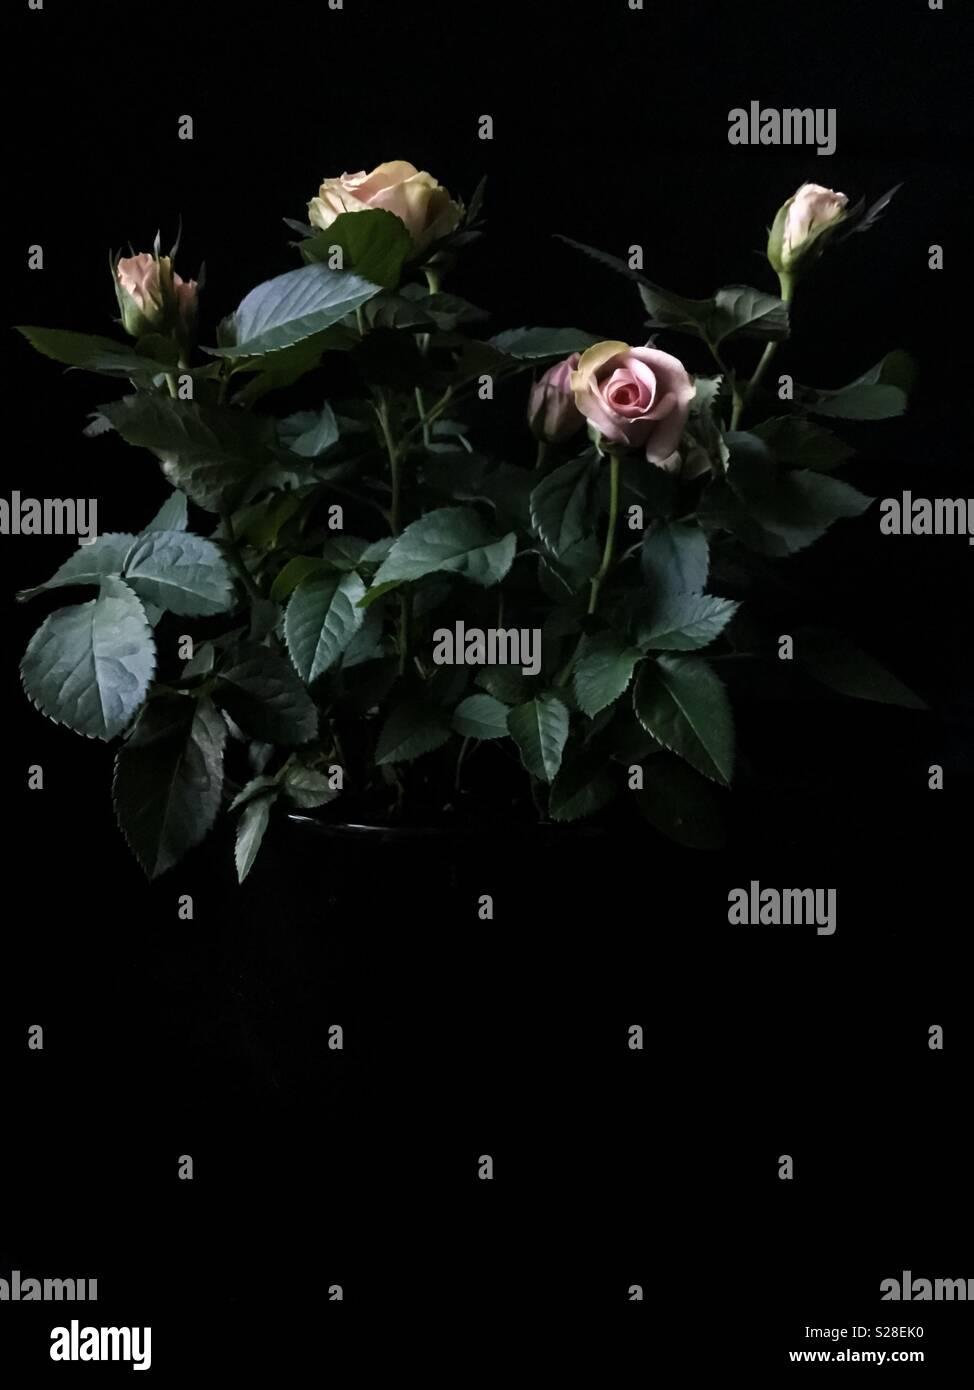 Pink rose bush on dark background - Stock Image